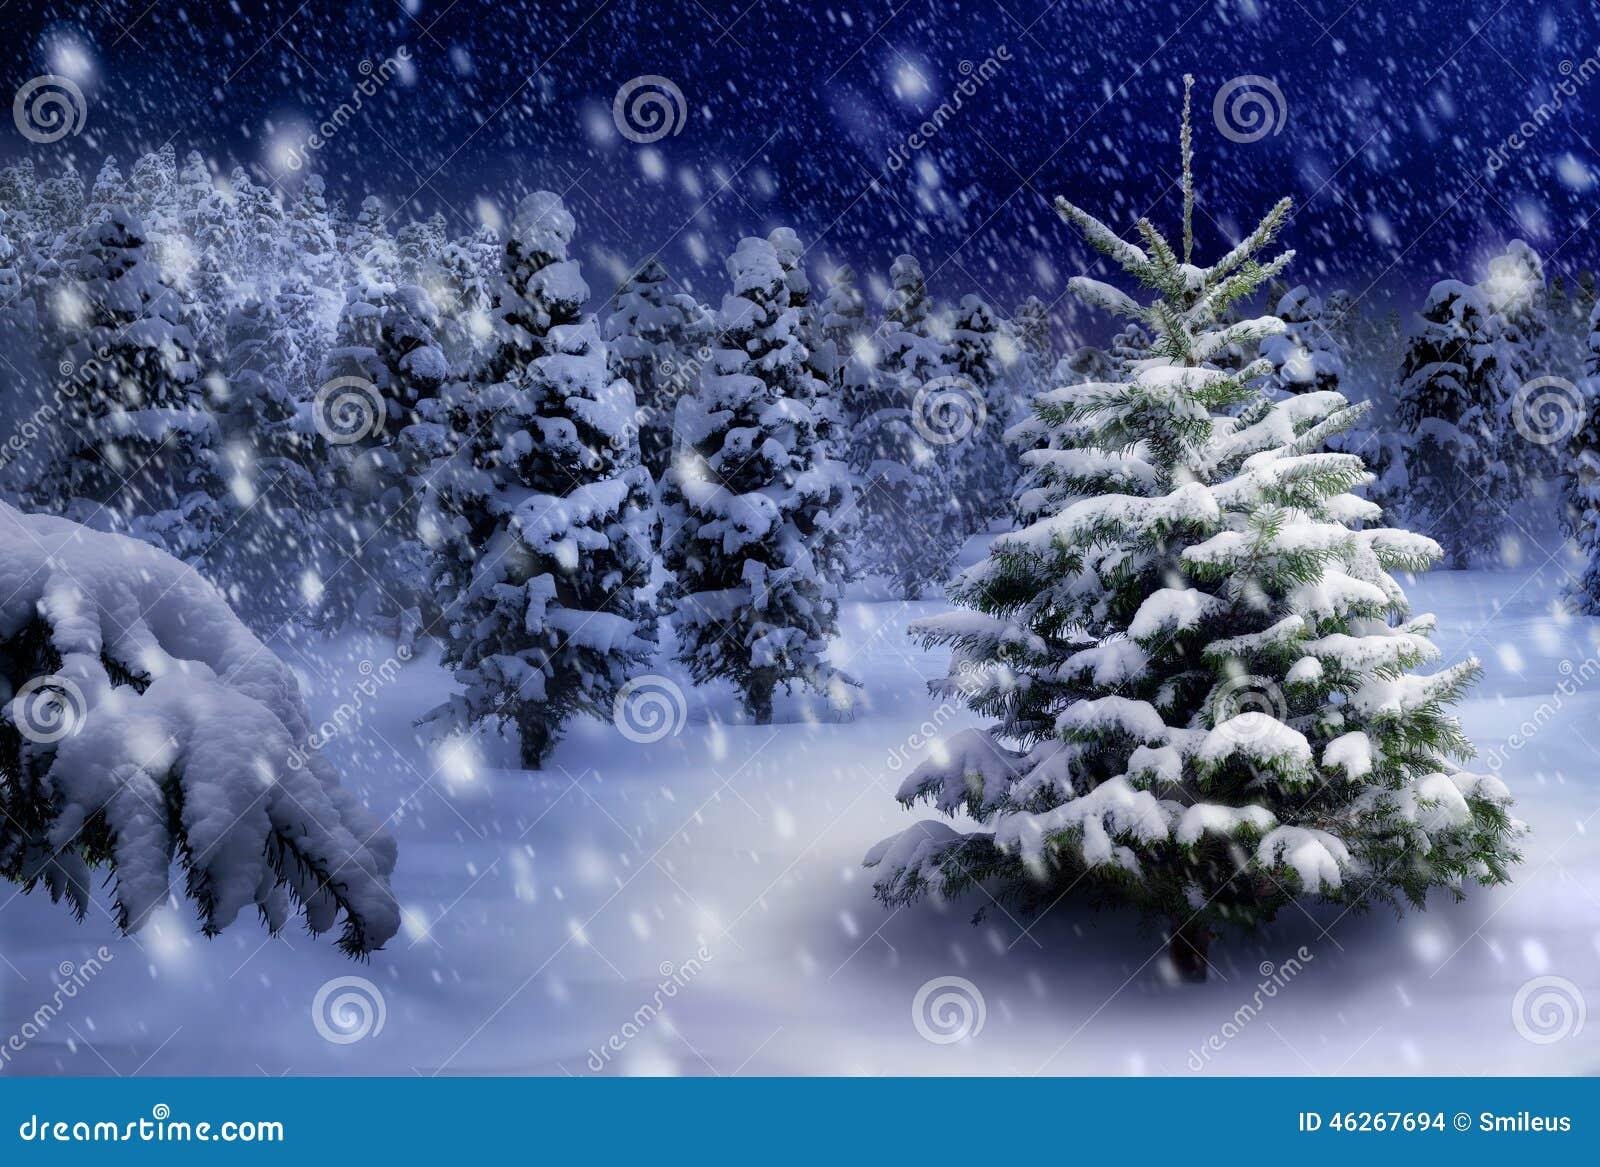 Fir Tree In Snowy Night Stock Photo Image 46267694